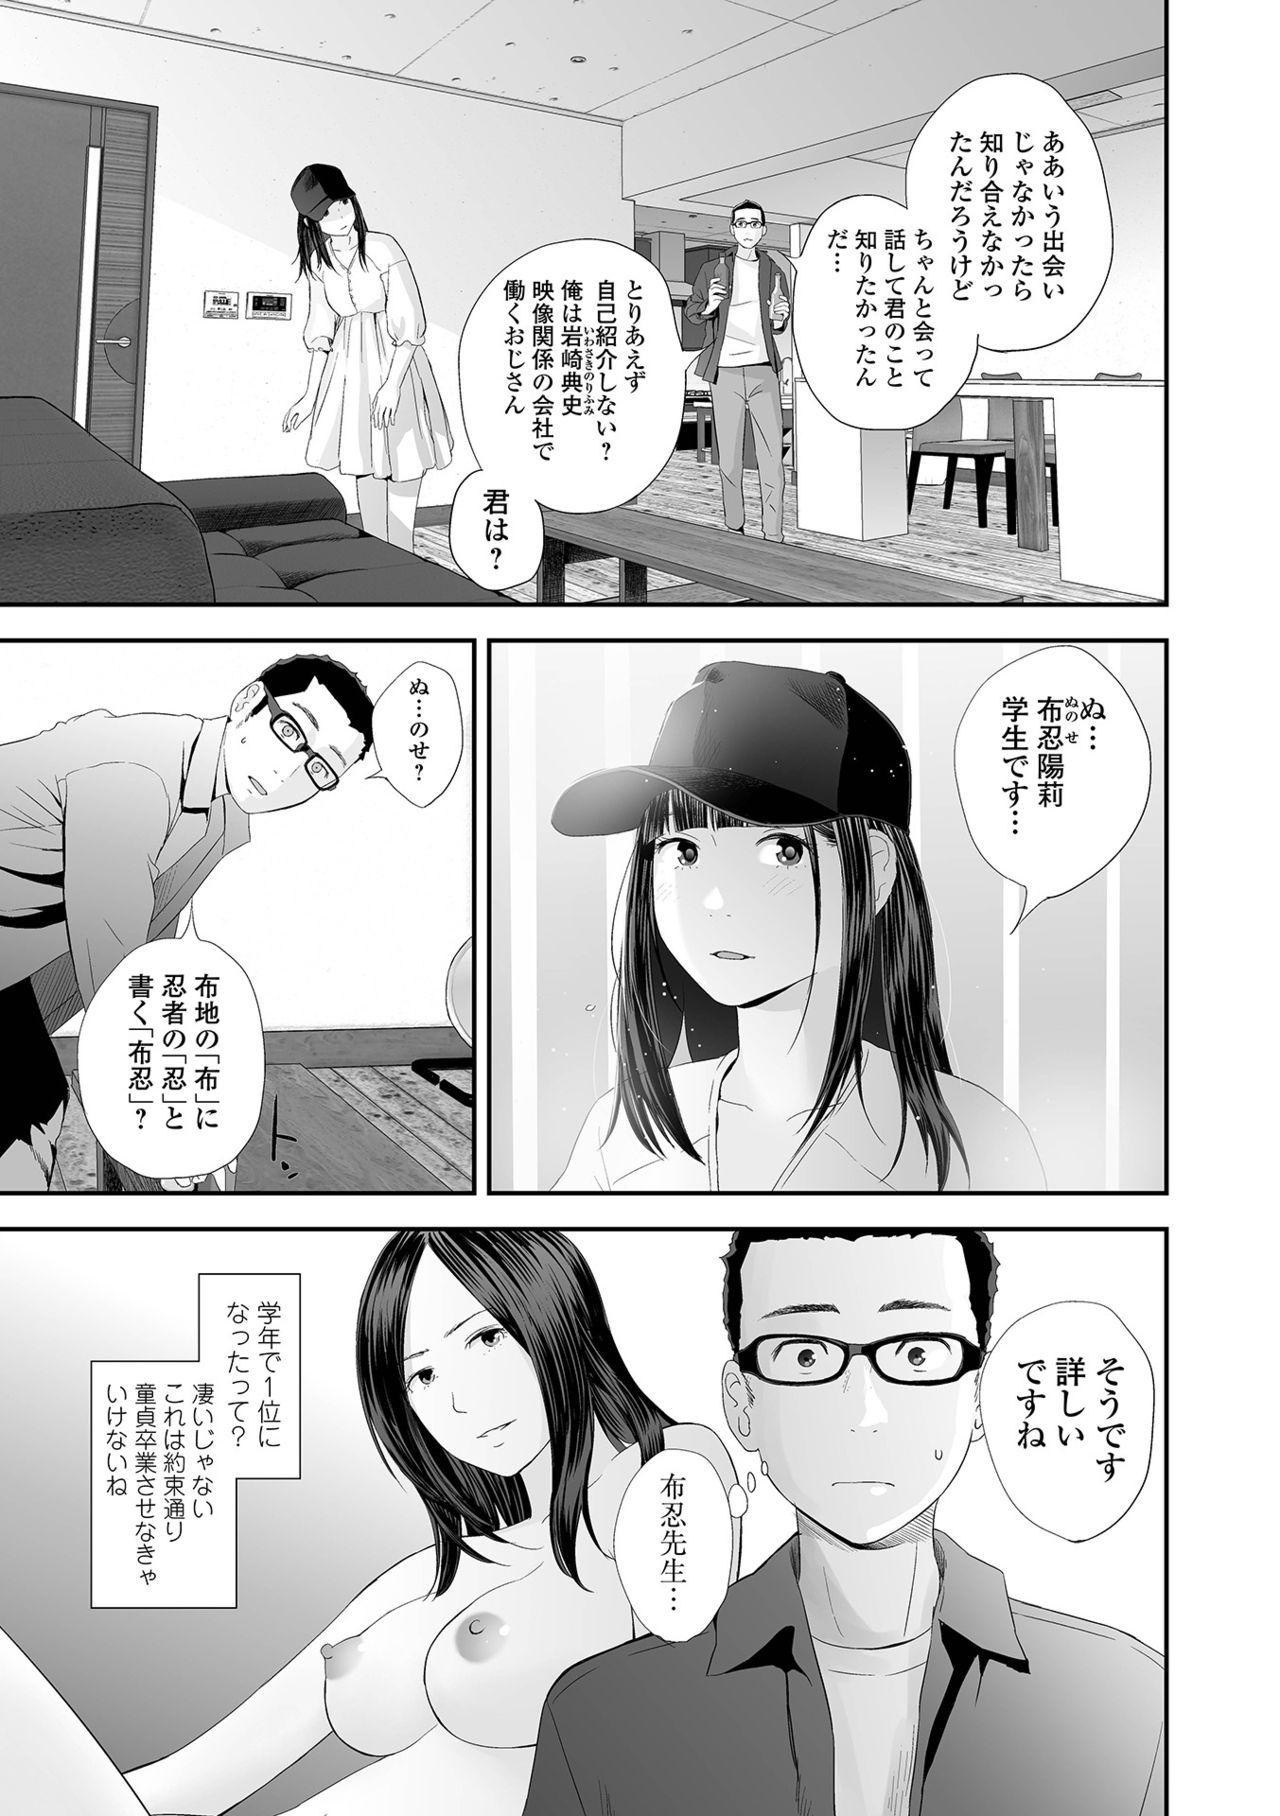 COMIC Shigekiteki SQUIRT!! Vol. 25 48